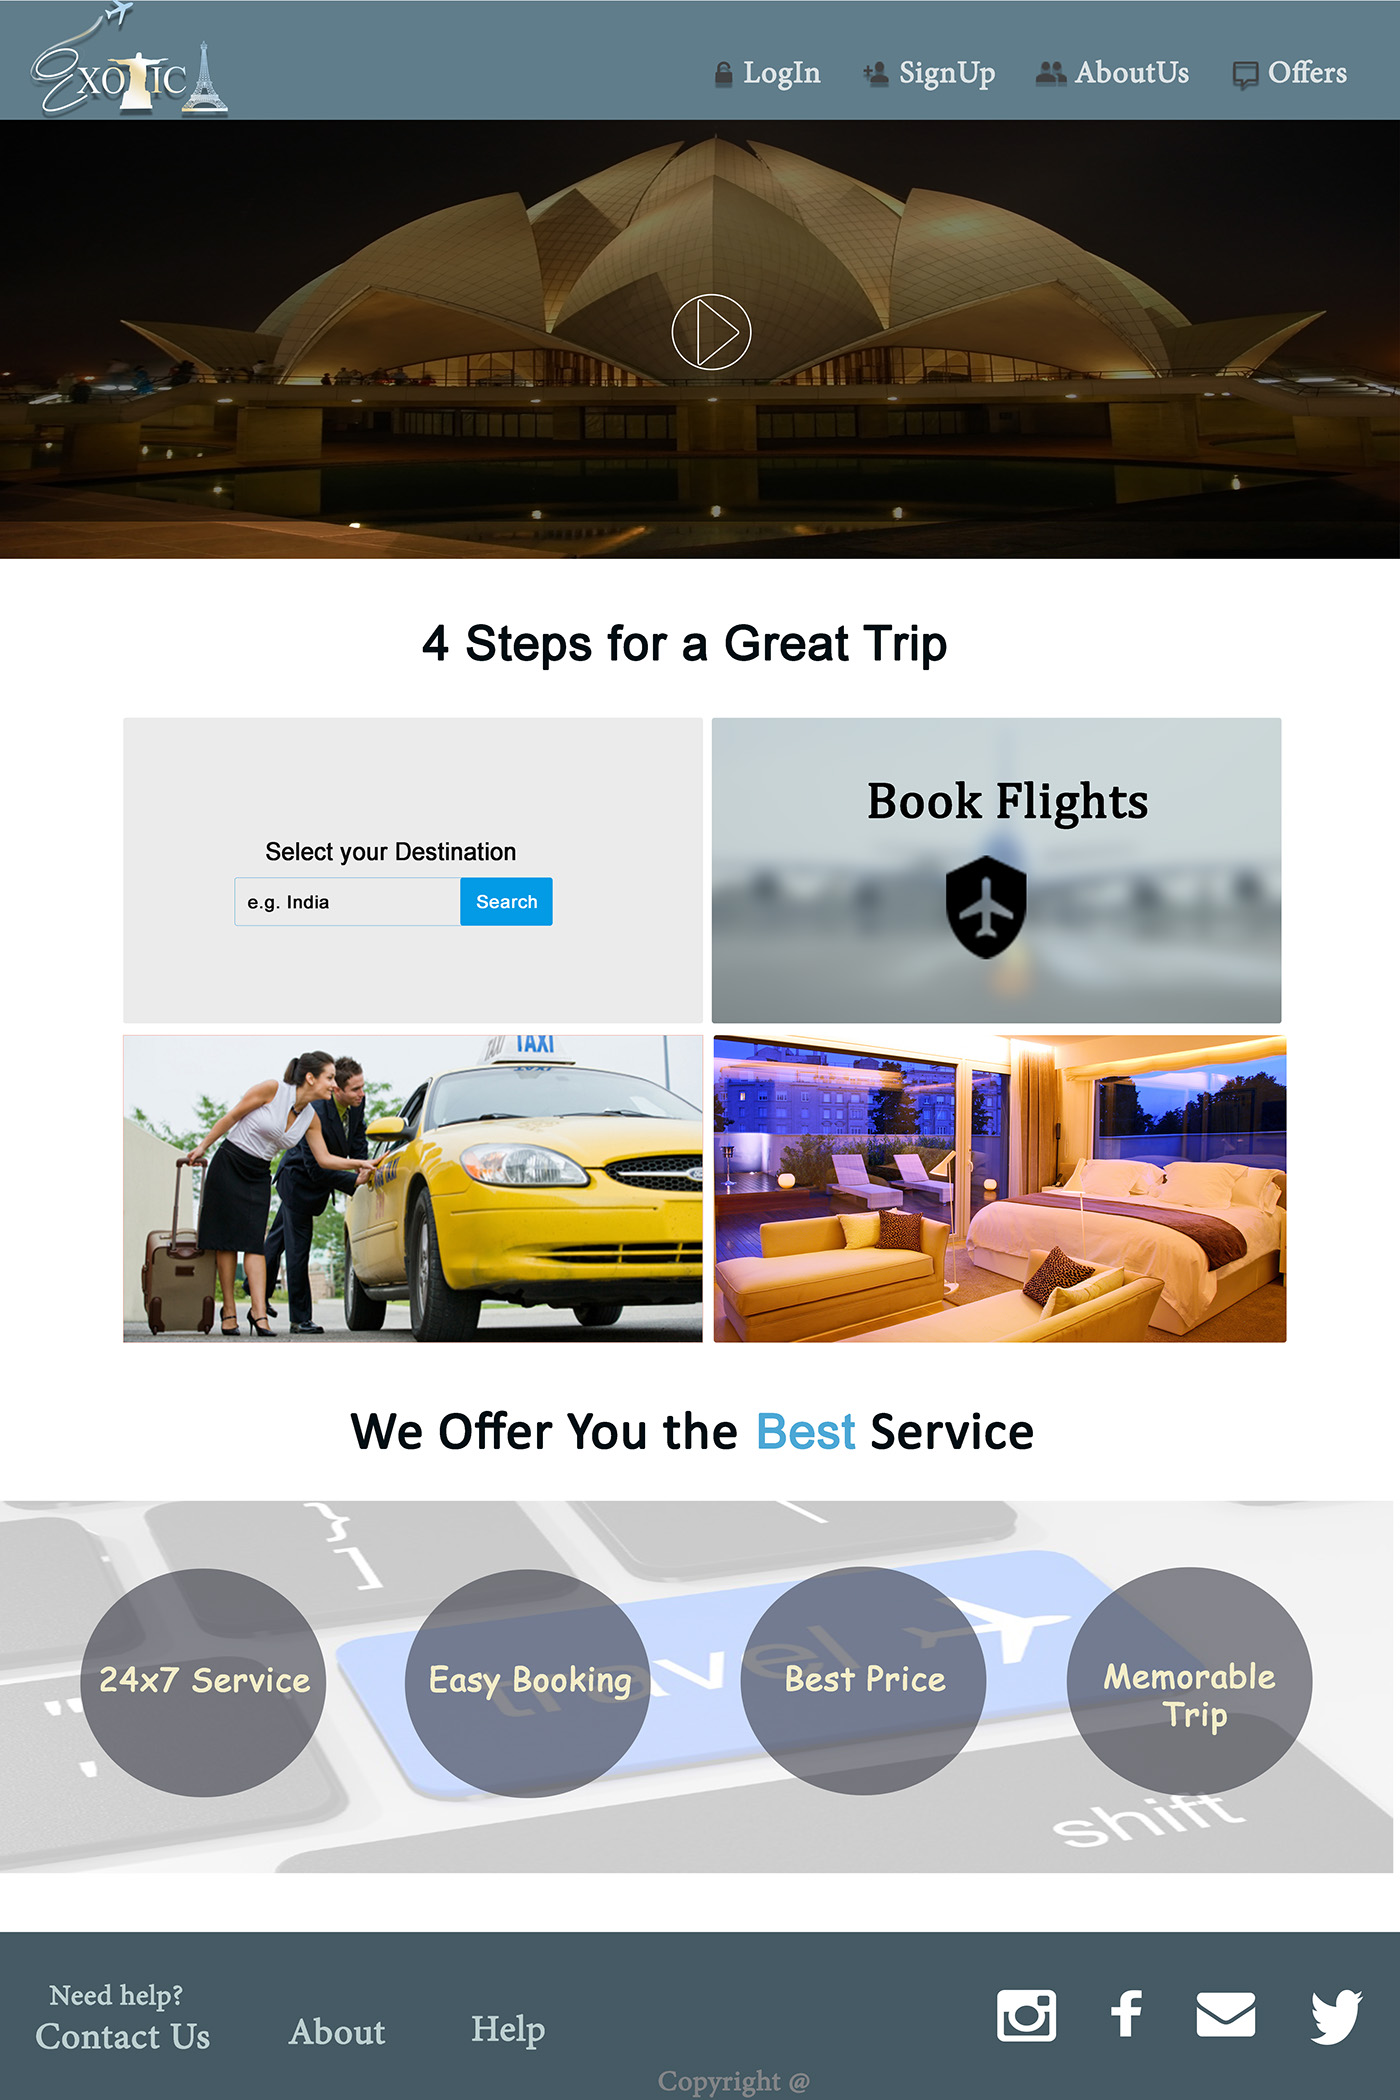 Exotica(Travel & Tour) on Behance